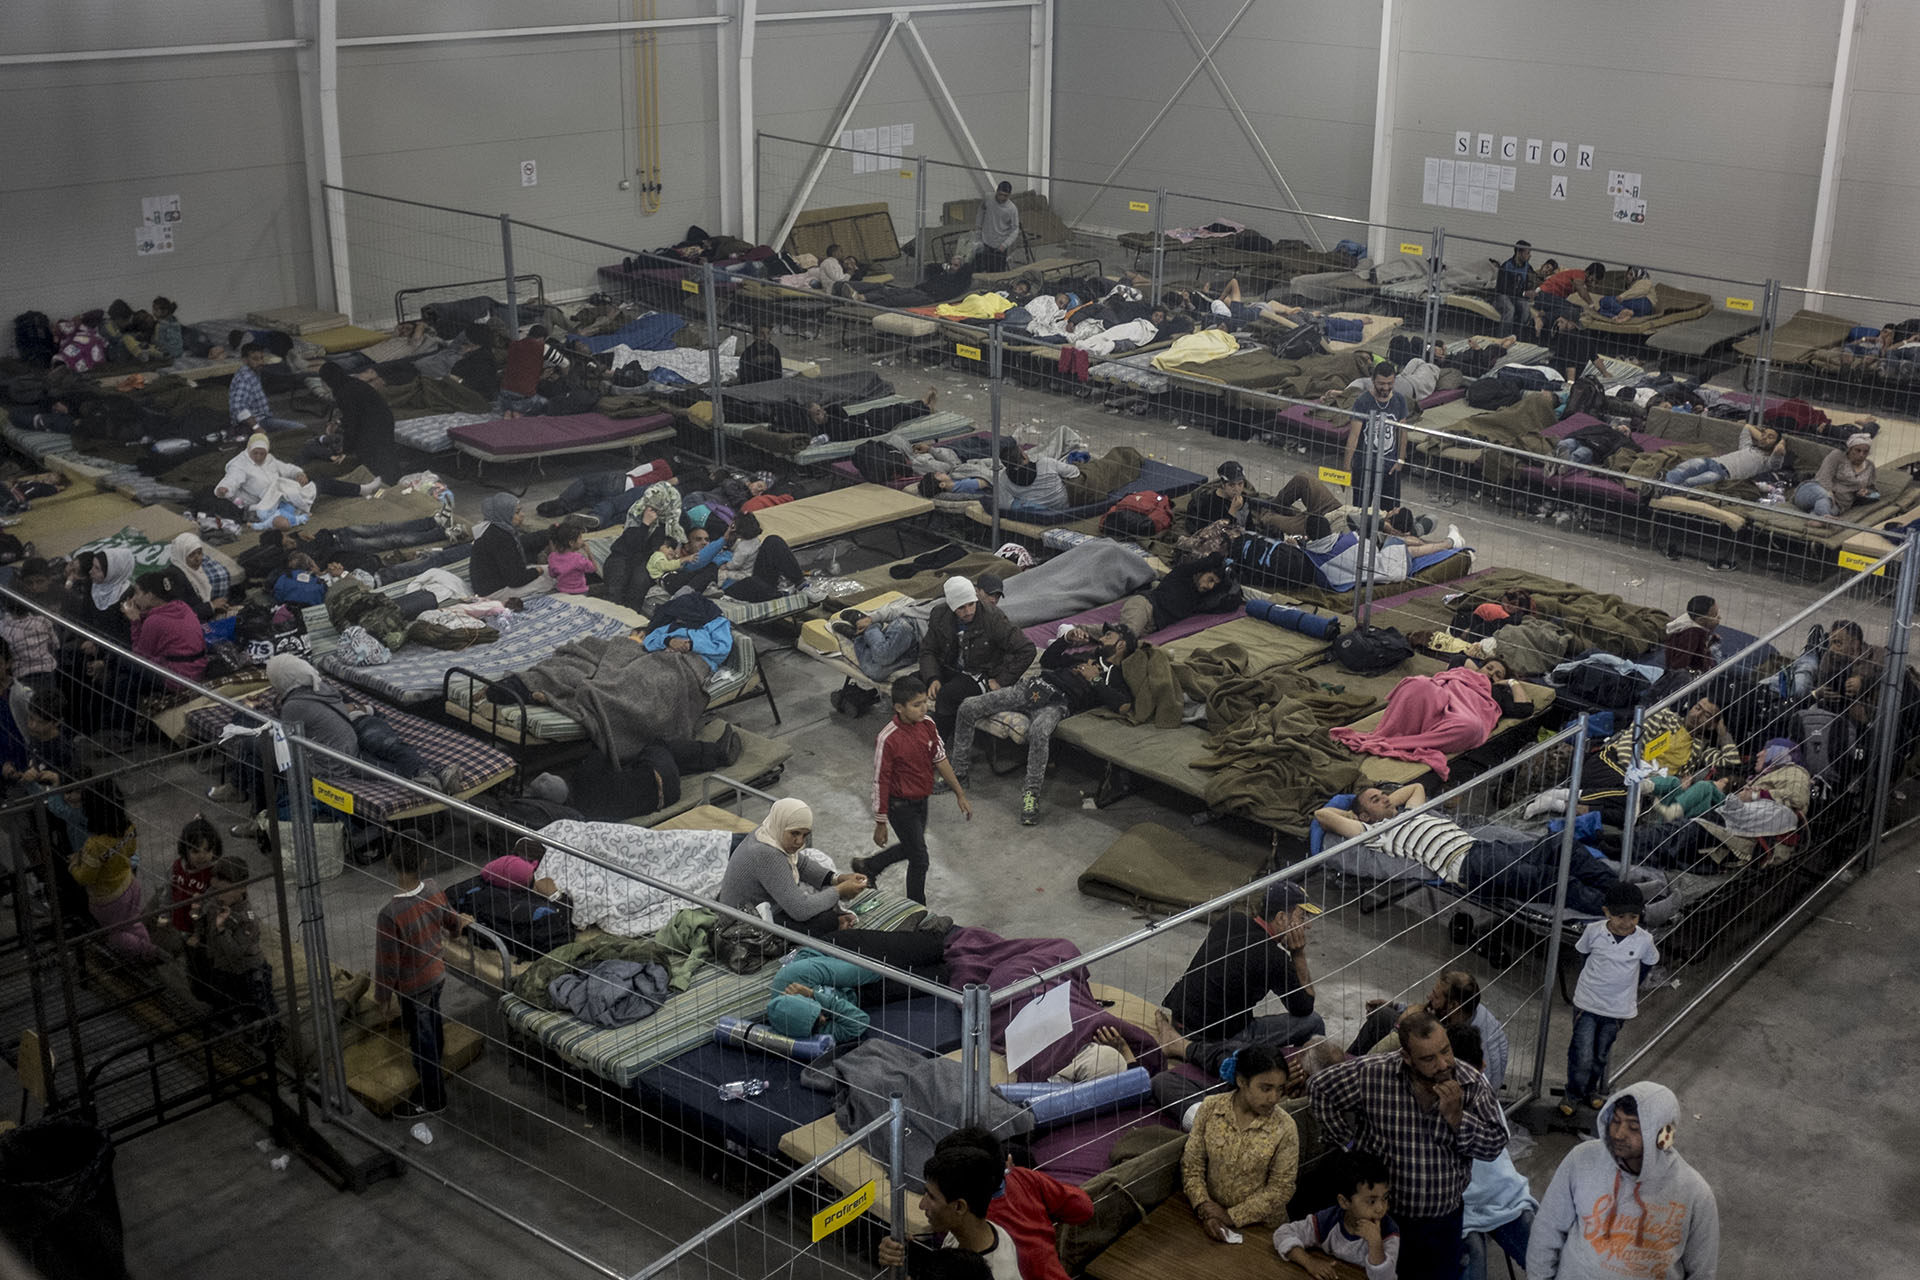 asylum seekers 8 Ice is now housing migrants and asylum seekers in federal prison june 8, 2018 tasos katopodis/getty images.